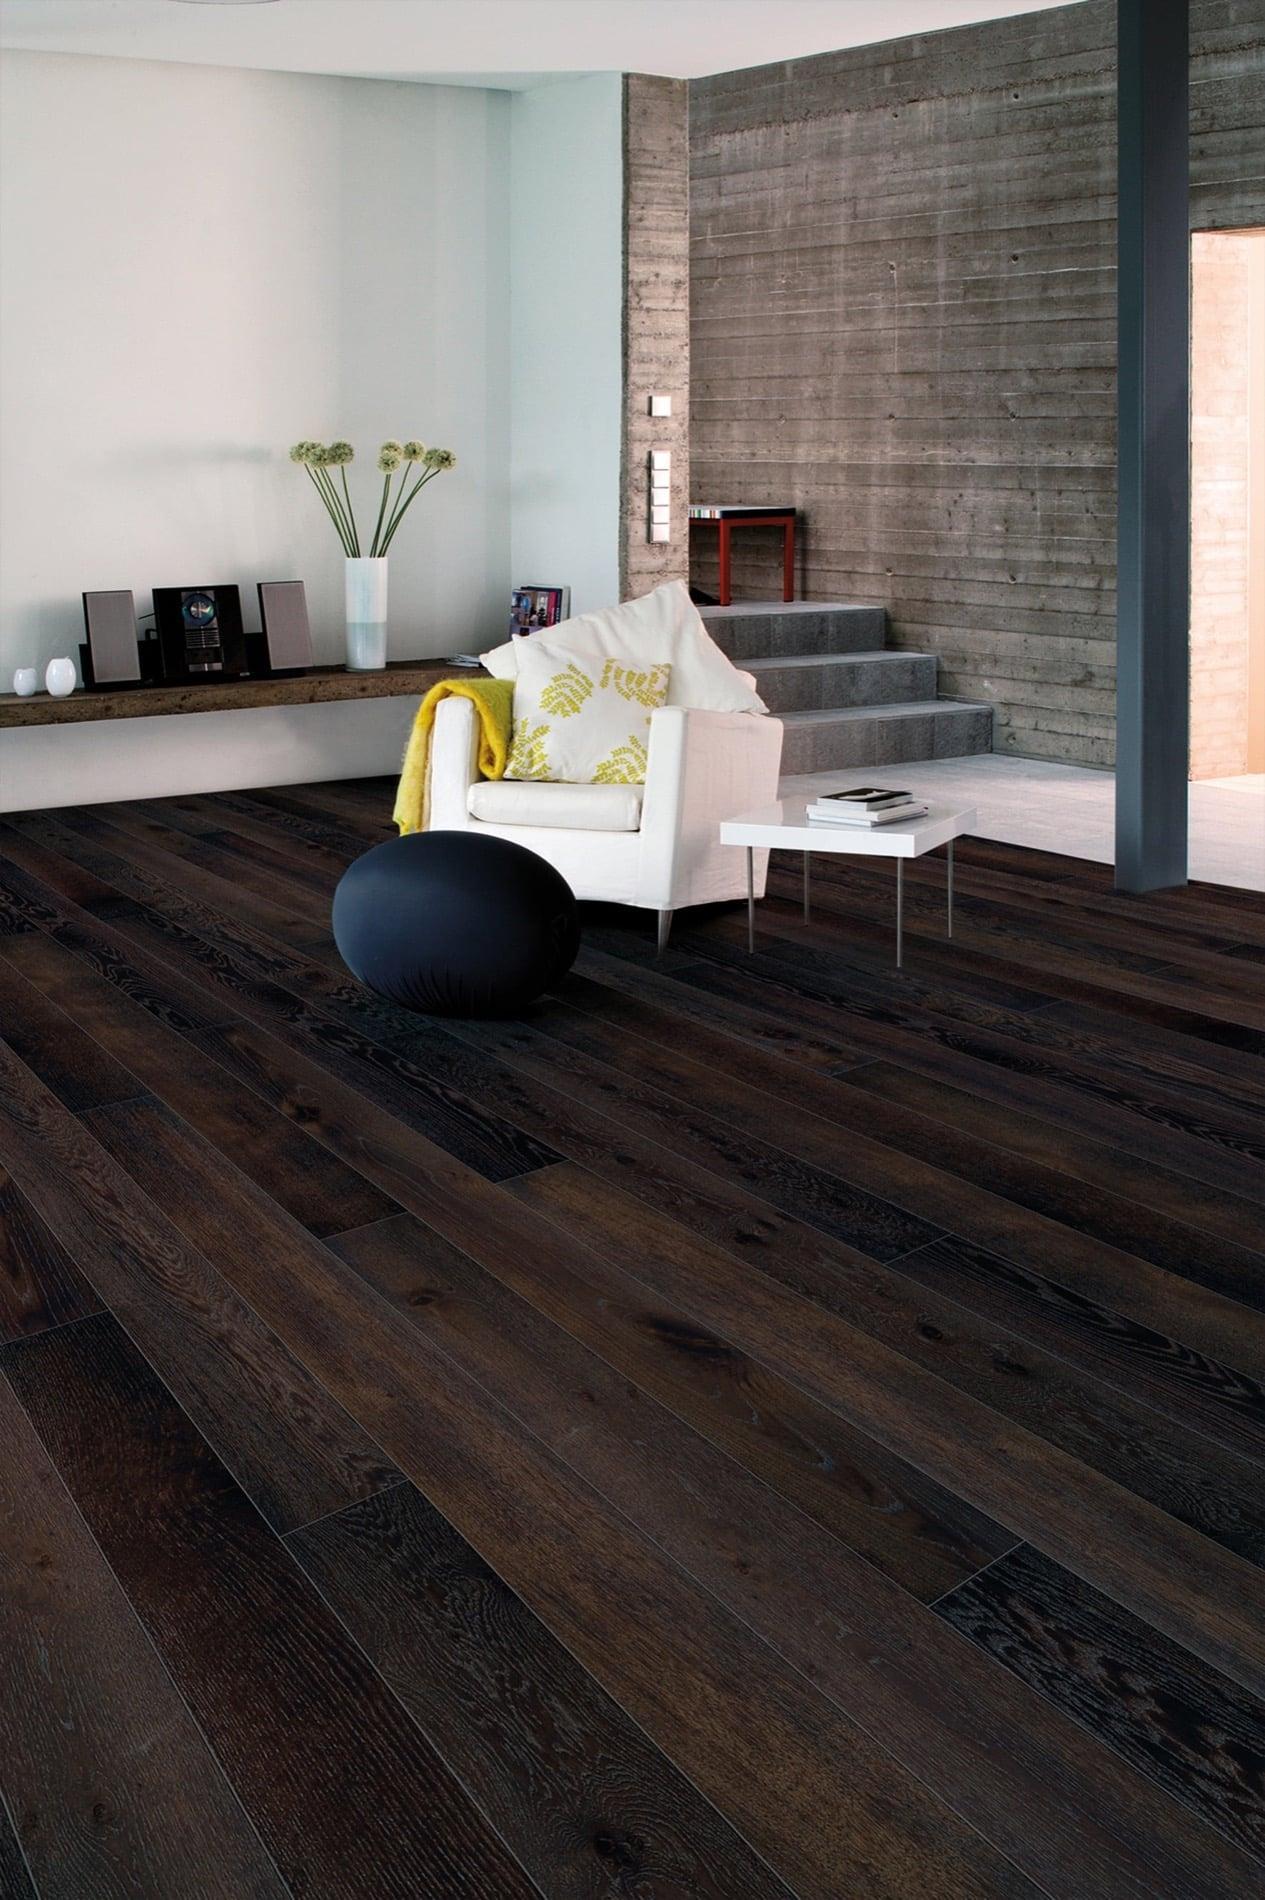 Timberwise parketti puulattia wooden floor parquet Tammi Oak Walnut